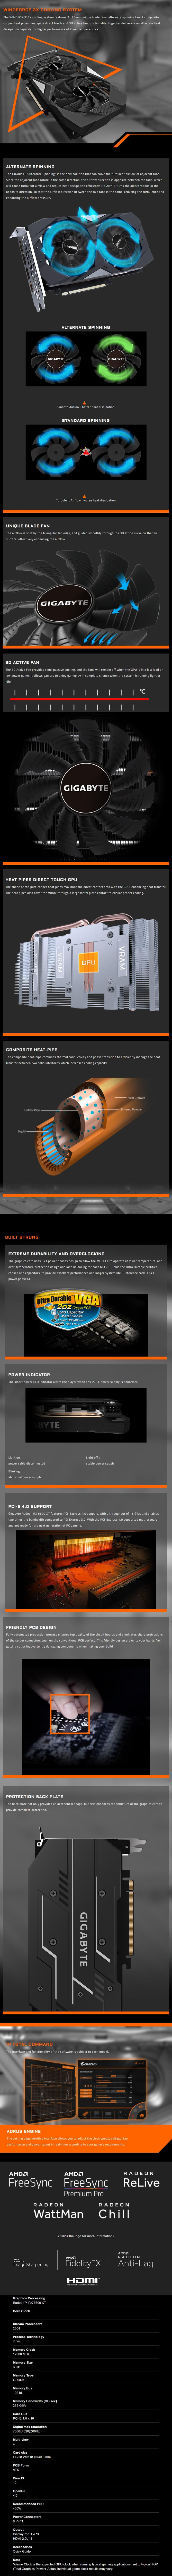 Gigabyte AORUS Radeon RX 5600 XT WINDFORCE OC 6GB Video Card - Overview 1